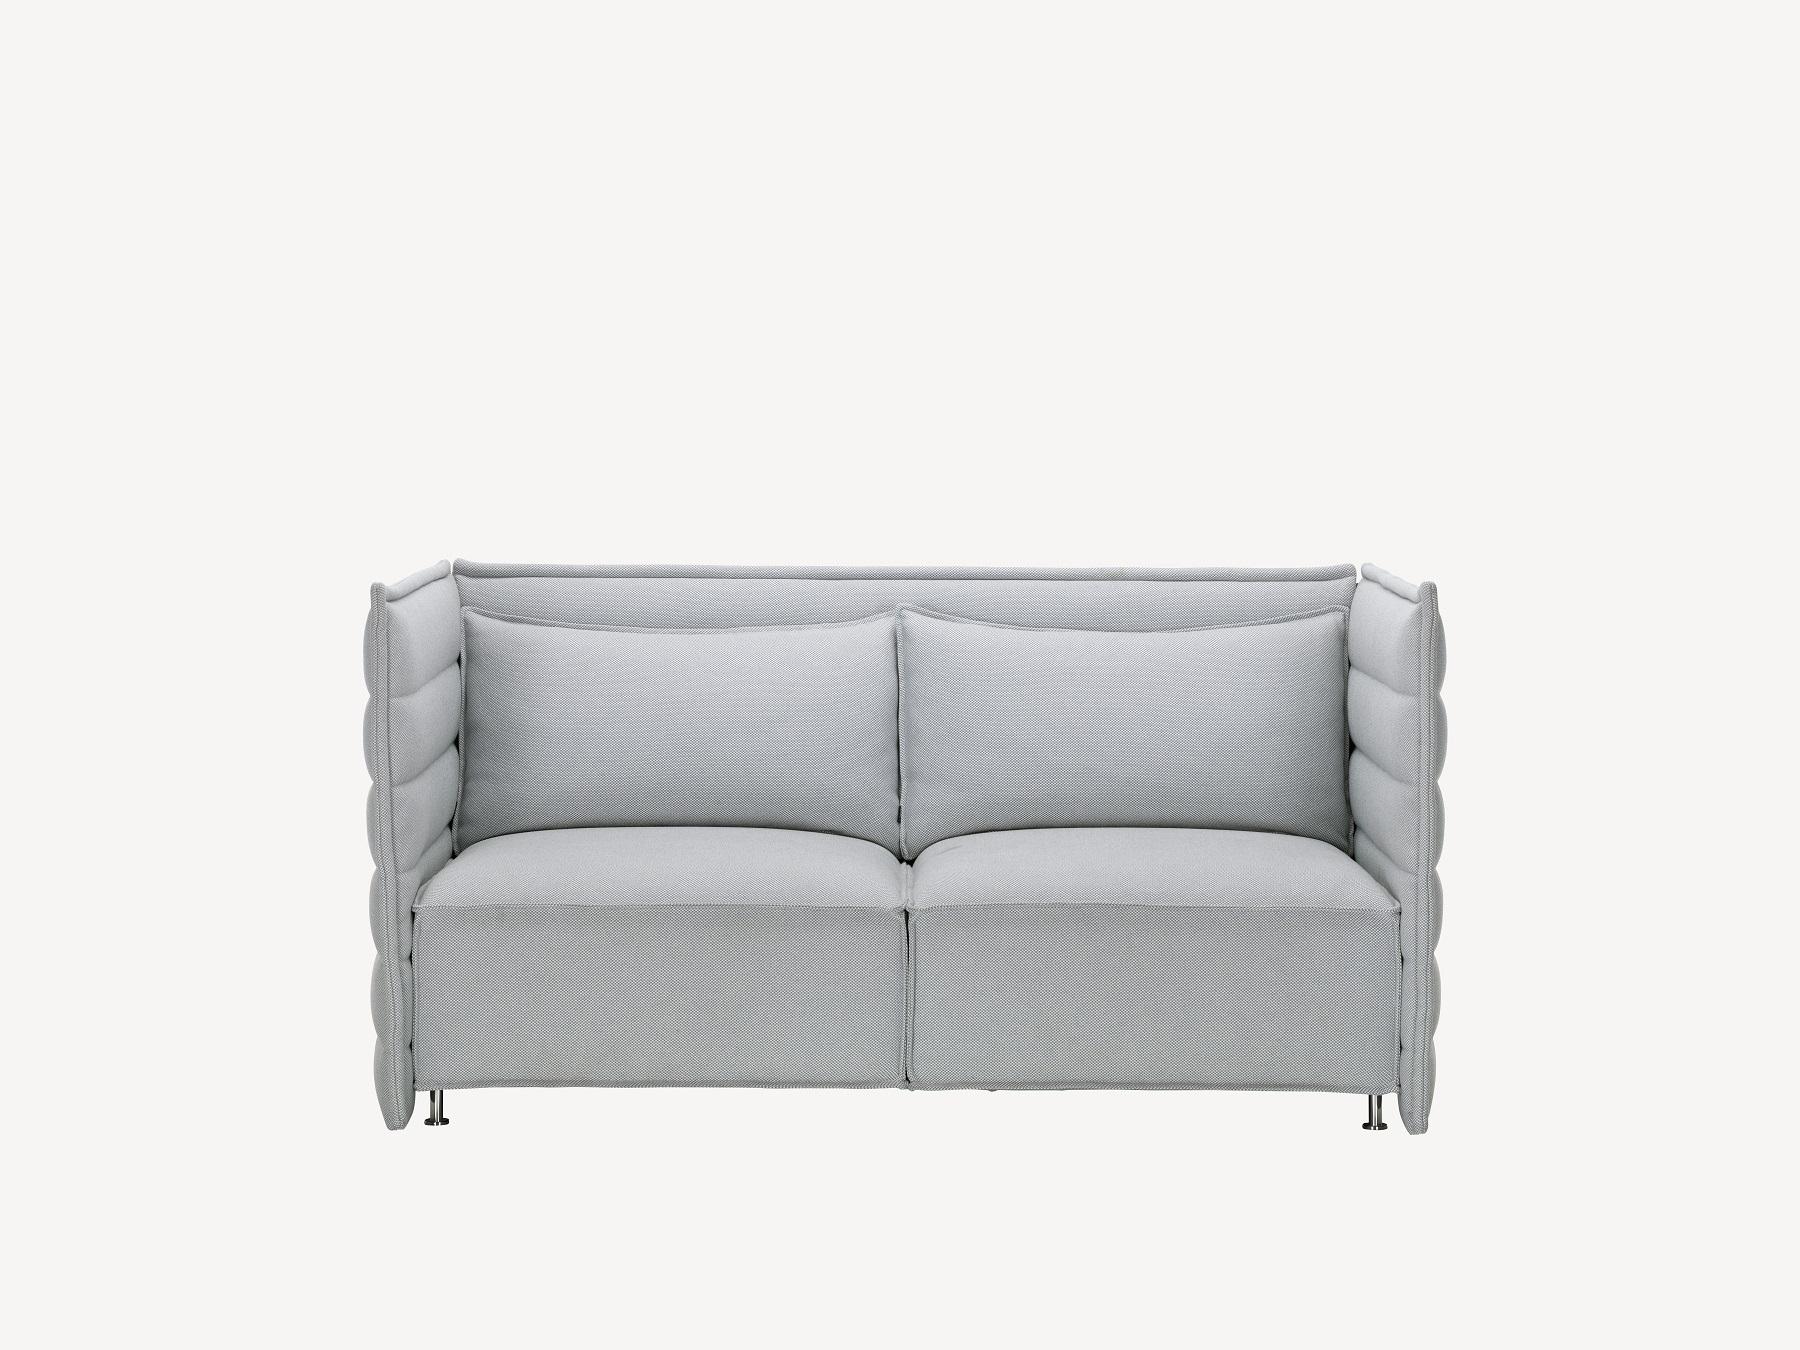 Full Size of Vitra Sofa Sofabord Dba Suita Gebraucht Jasper Morrison Dimensions Bed Noguchi 3 Seater Mariposa Grand Sale Marshmallow Eames Plate Alcove Dwg Das Plume Sofa Vitra Sofa